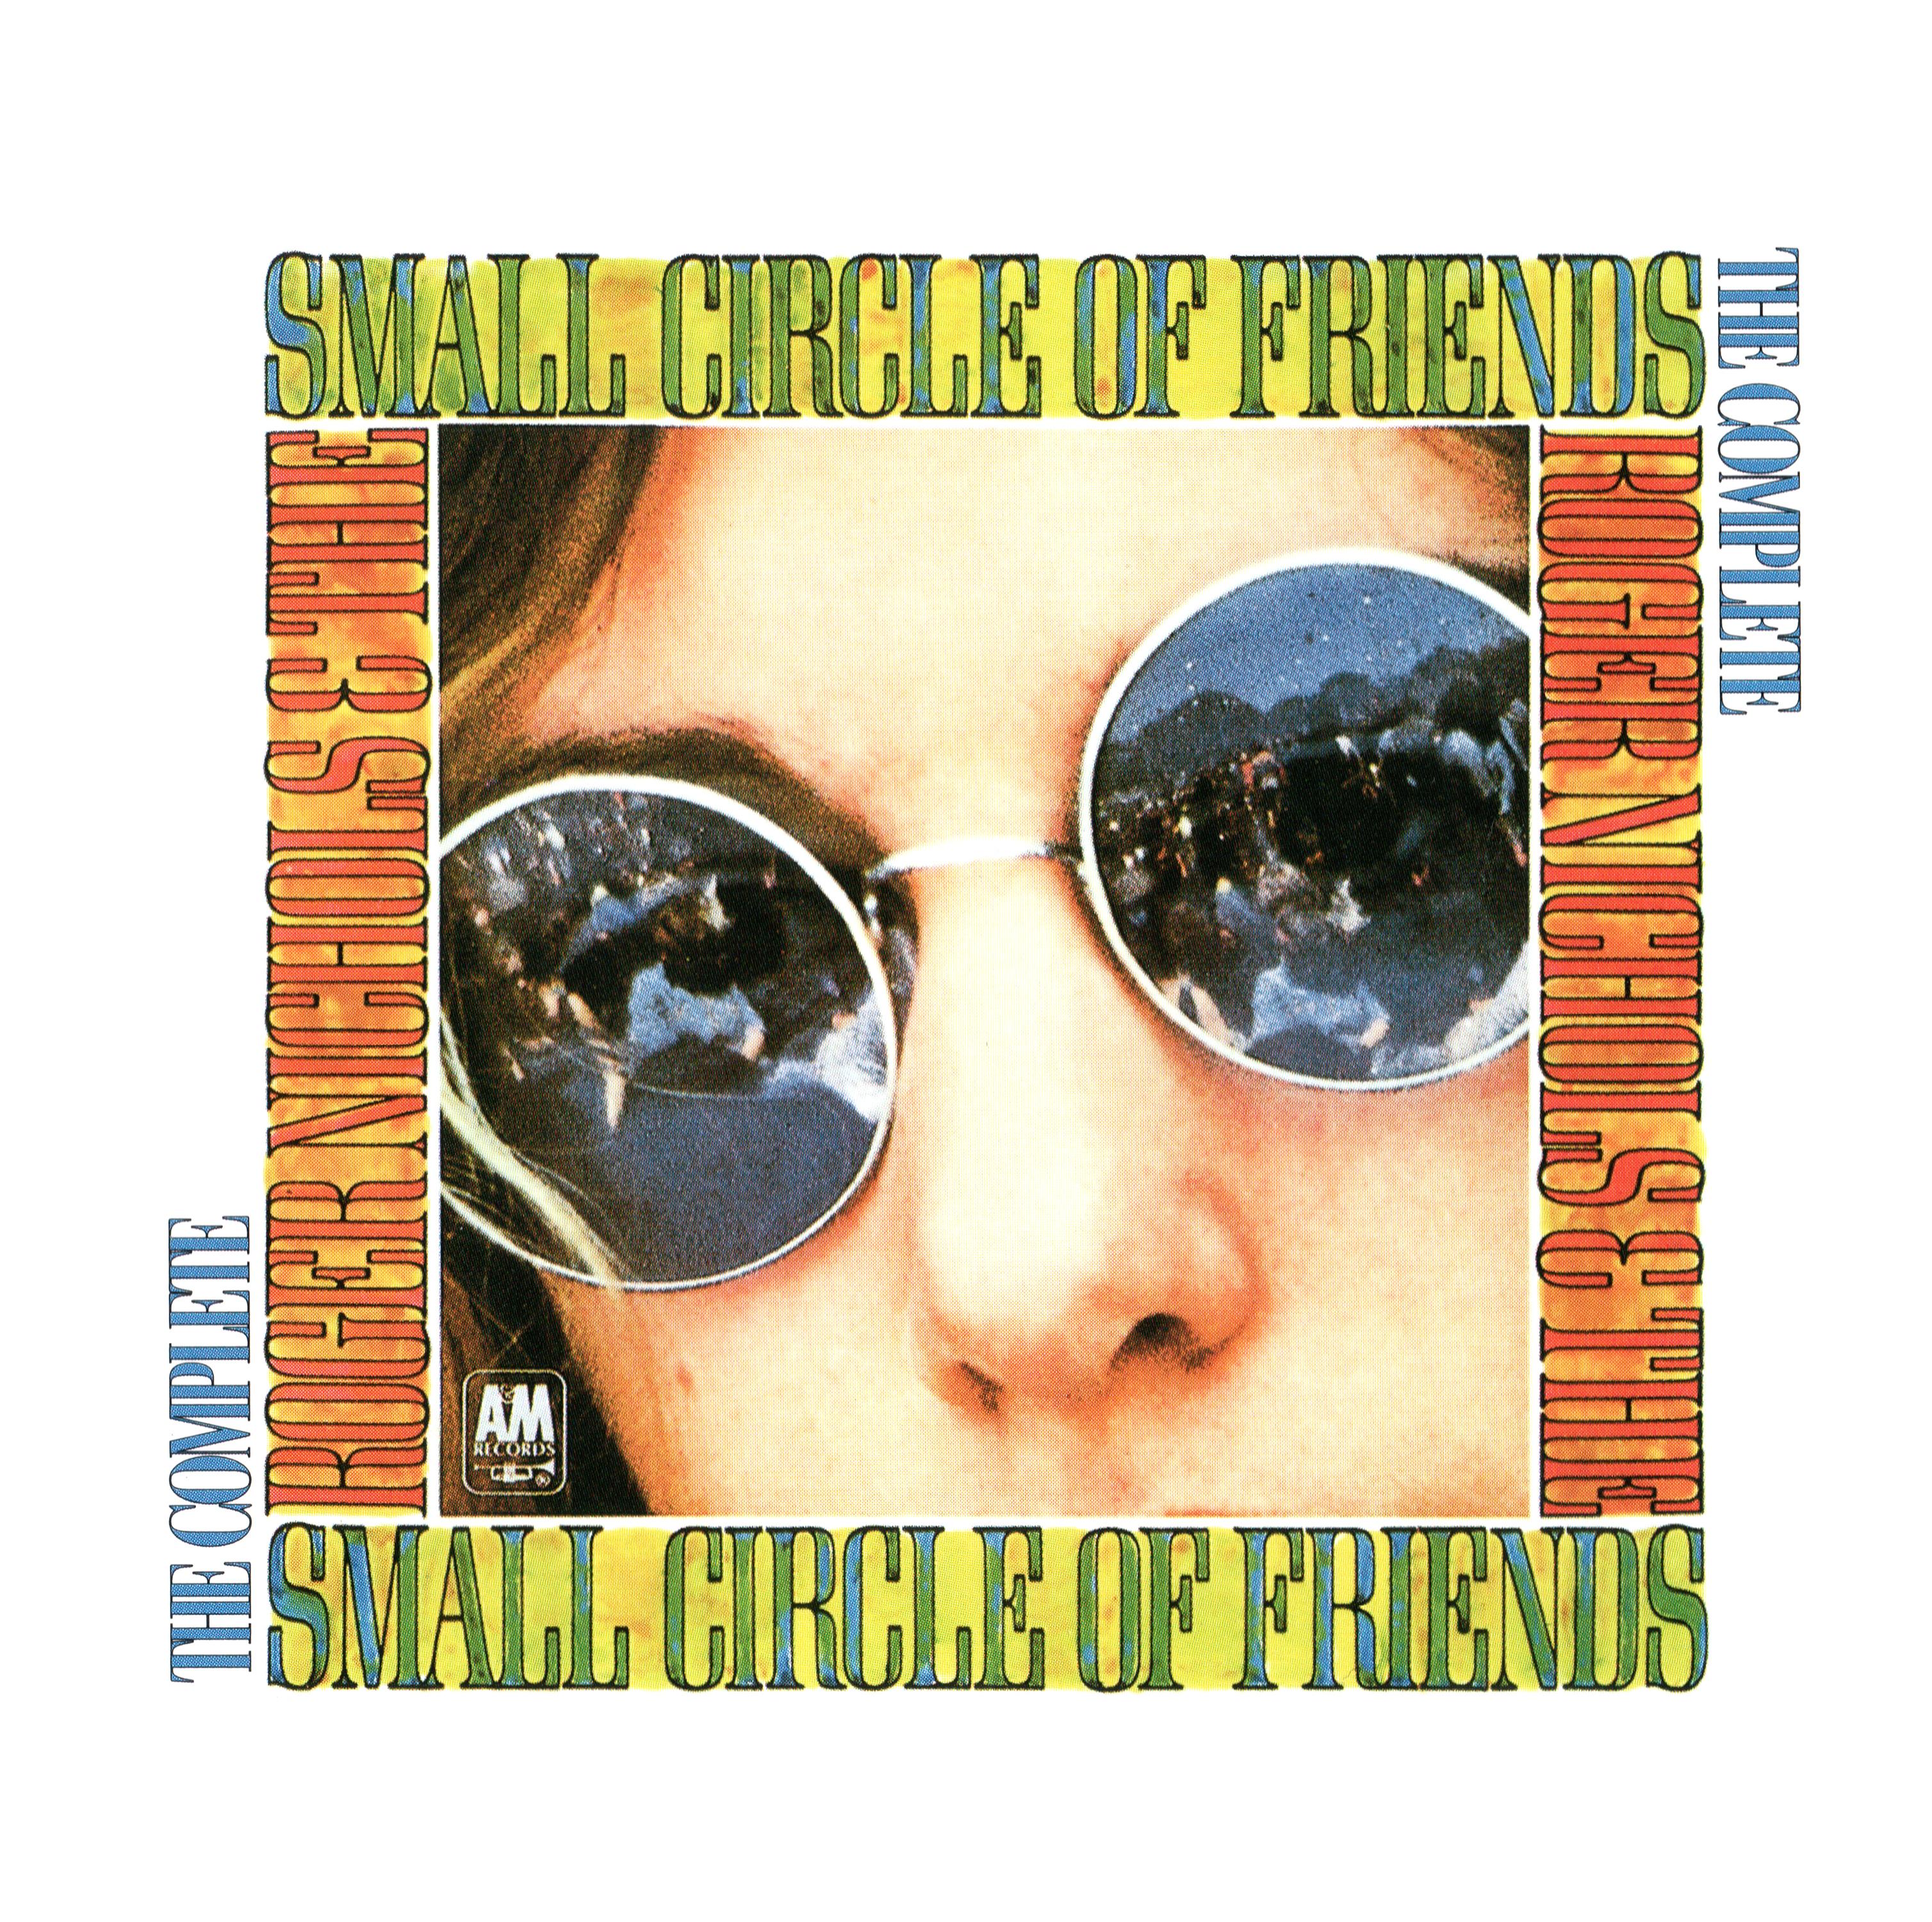 Roger Nichols and the Small Circle of Friends『コンプリート・ロジャー・ニコルズ&ザ・スモール・サークル・オブ・フレンズ』(1997年8月6日発売) 高画質CDジャケット画像 (ジャケ写)